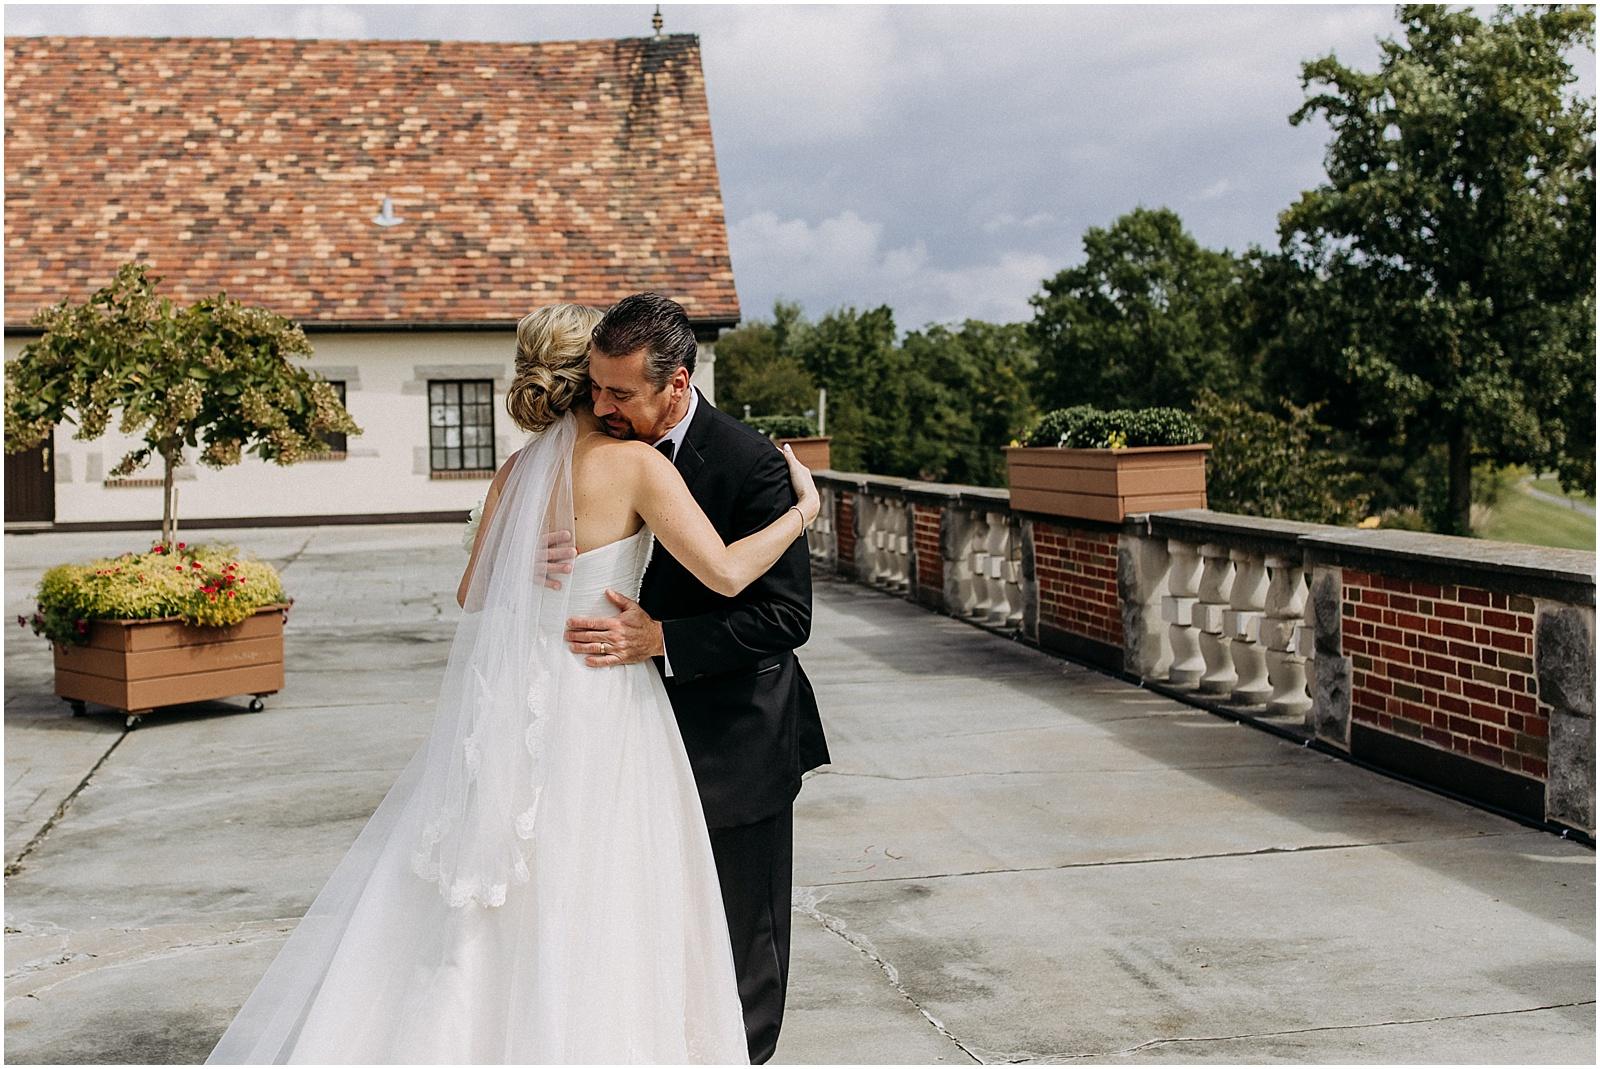 glen_echo_st_louis_mo_wedding_0041.jpg